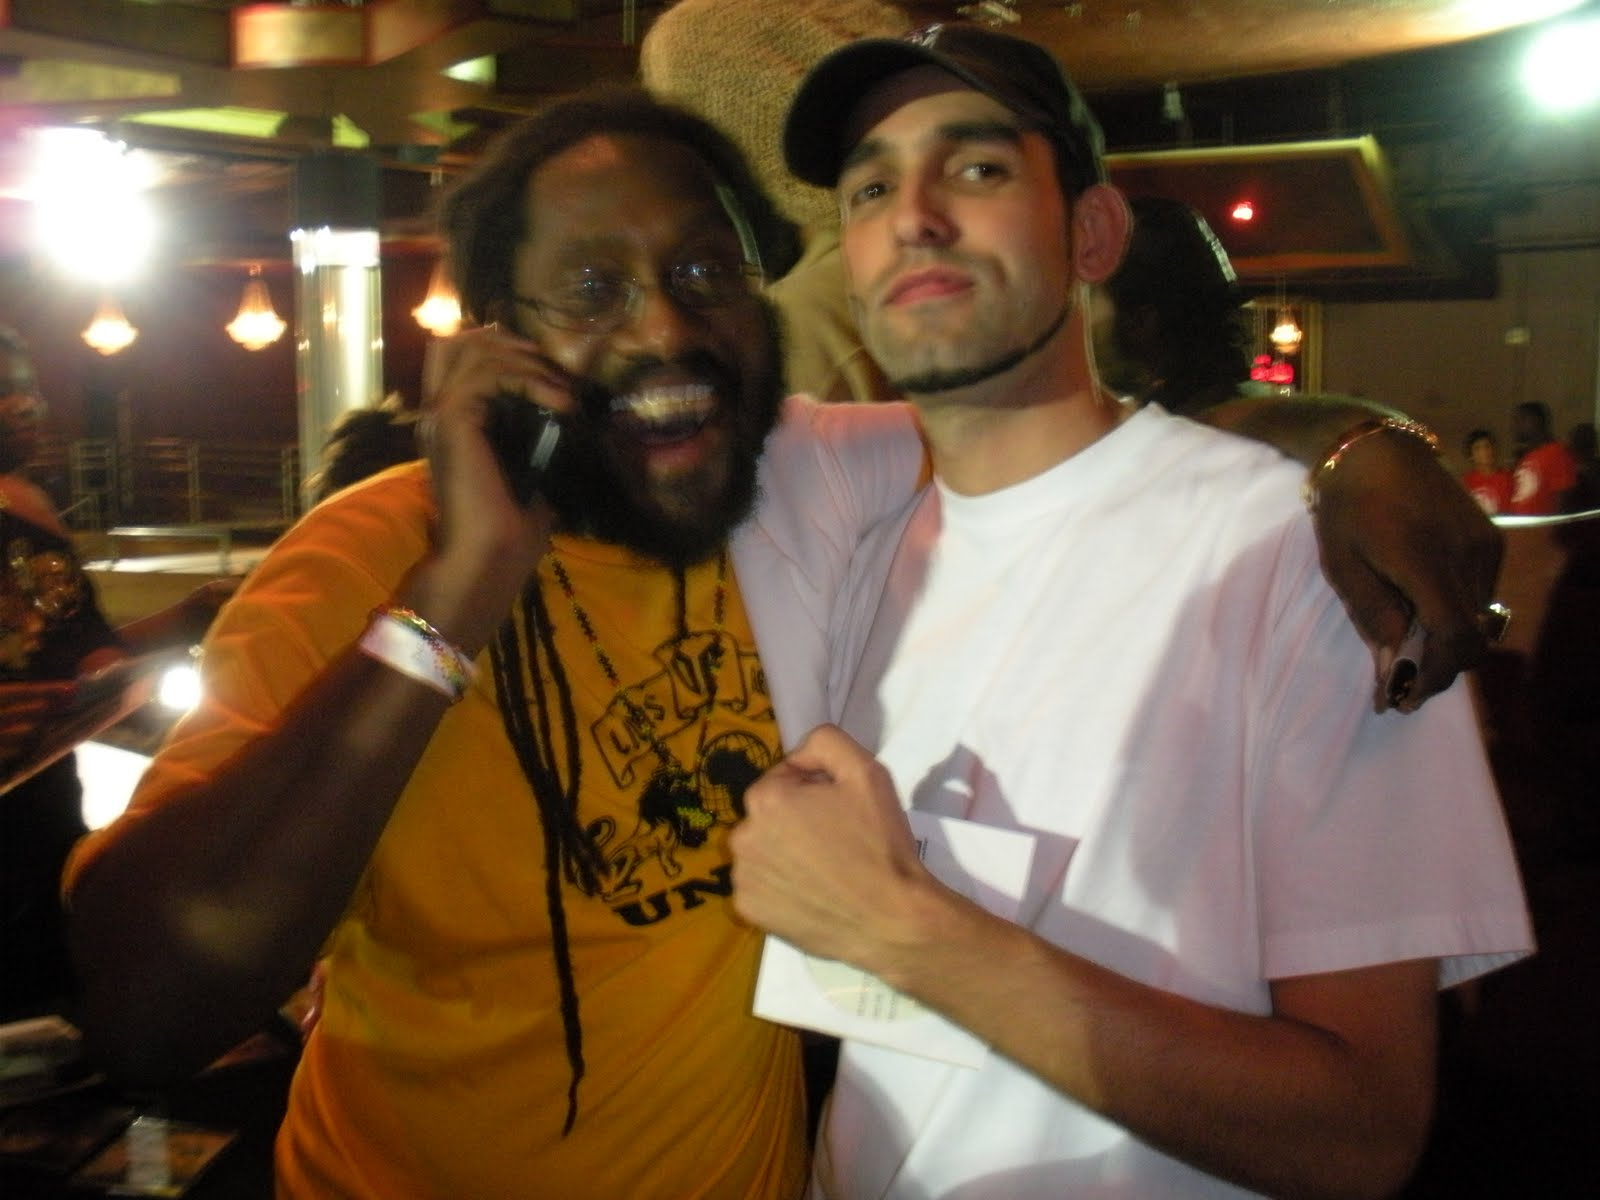 Who Jah Bless No Man Curse August 2010